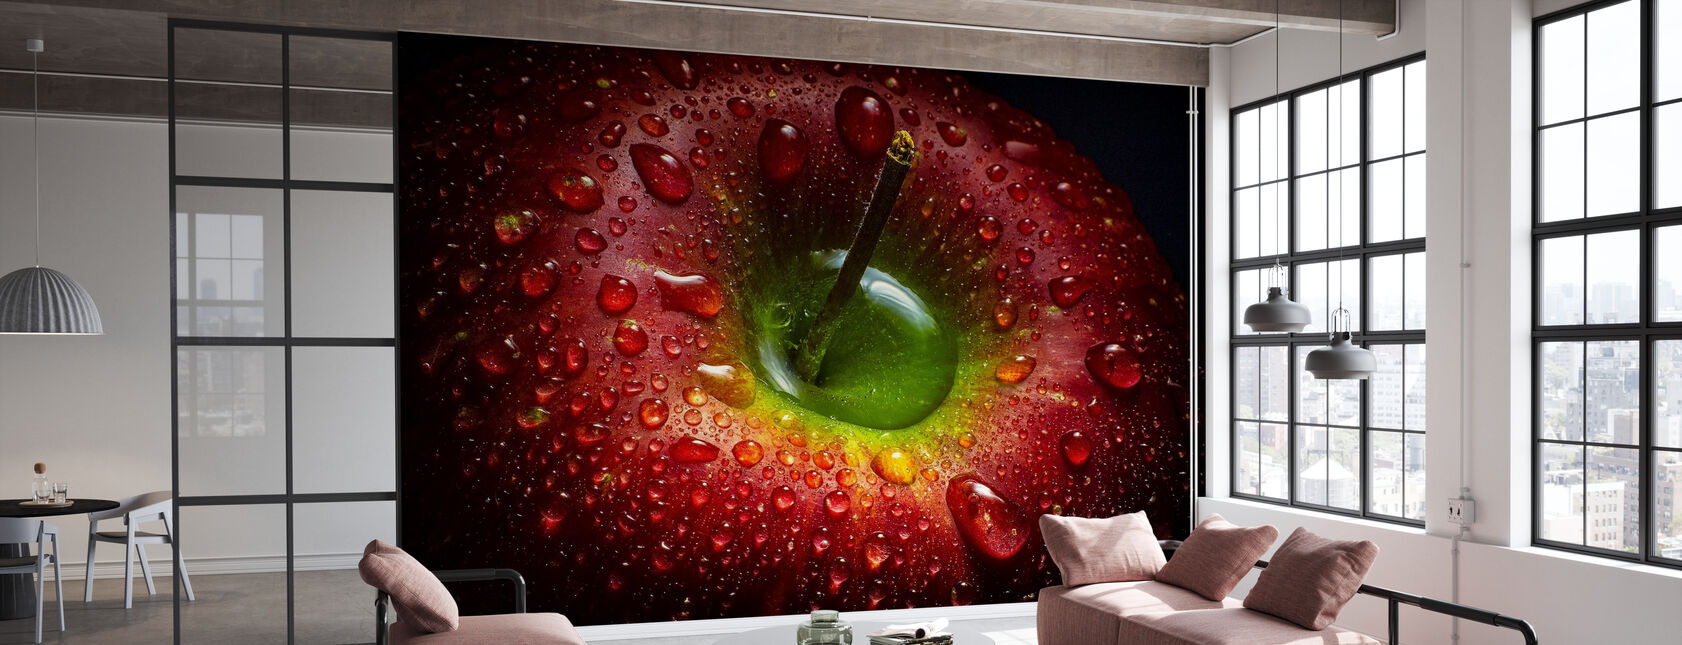 Red Apple - Wallpaper - Office